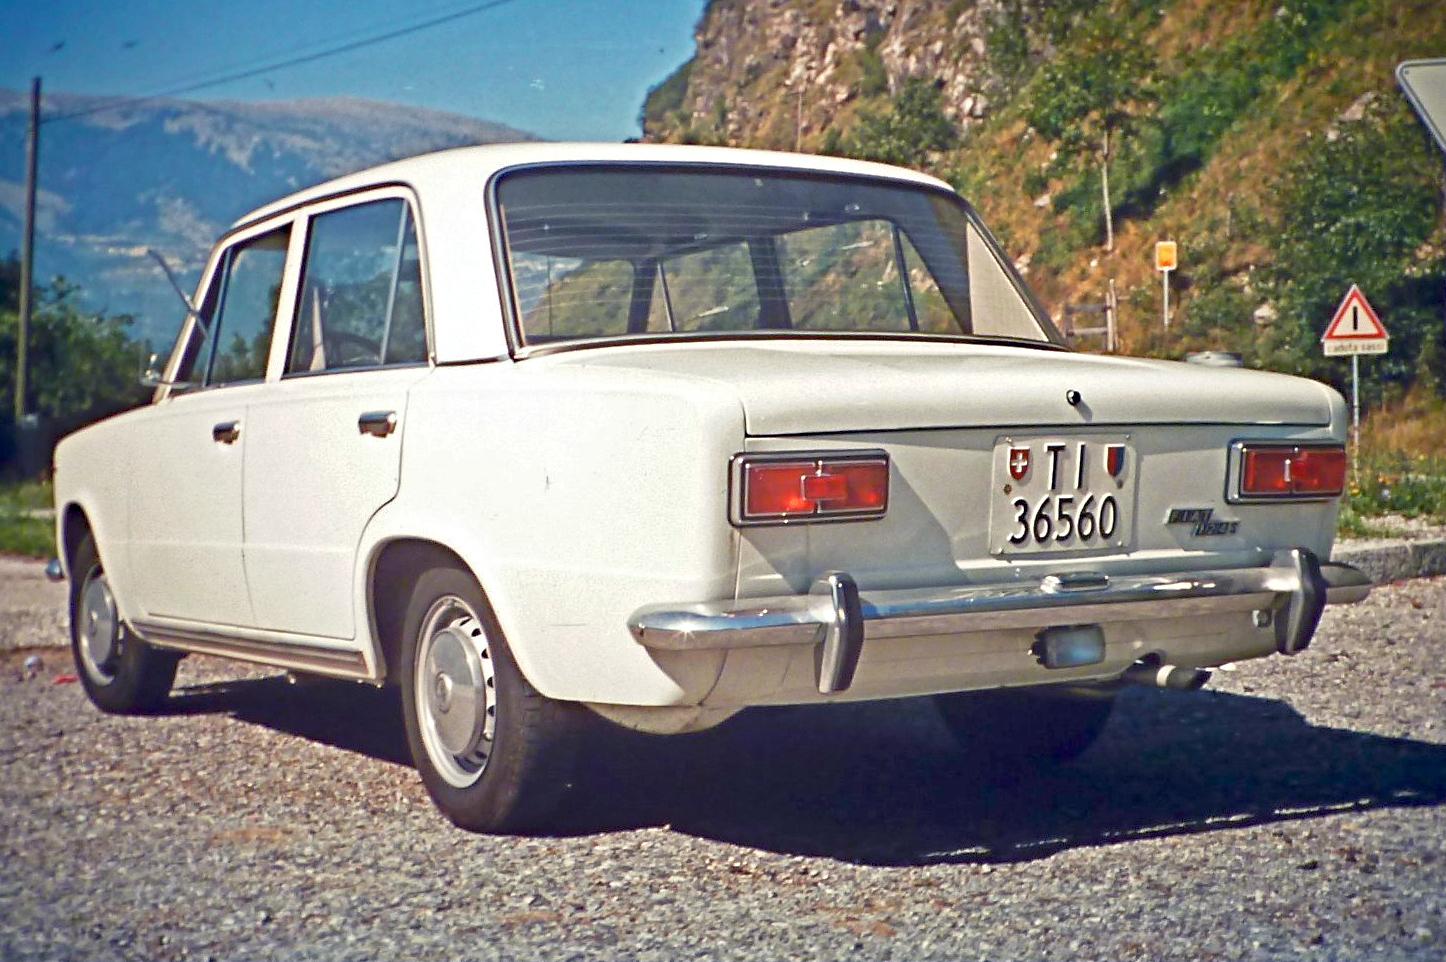 1972 fiat 124 s?w=840 fiat history part iv 1966 1979 myn transport blog  at mifinder.co